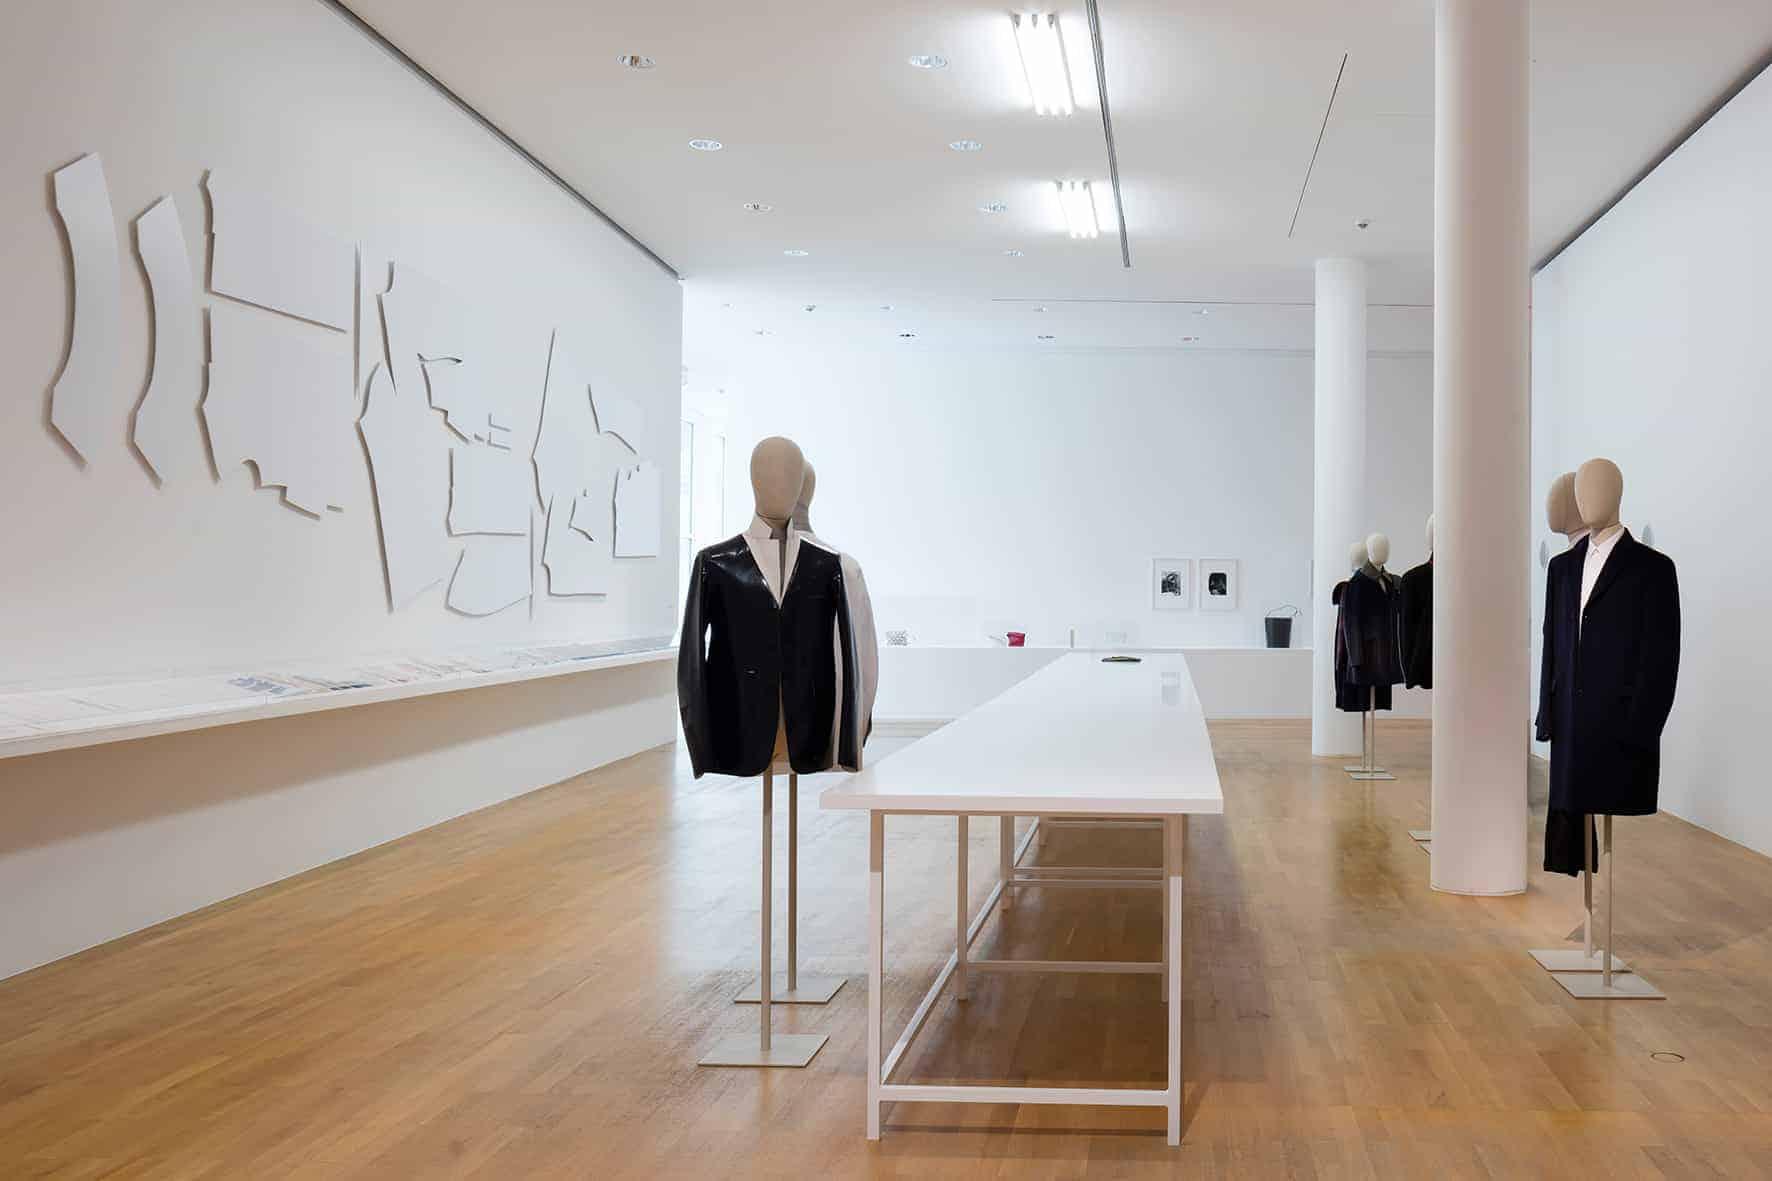 Jil Sander Exhibition - Present Tense